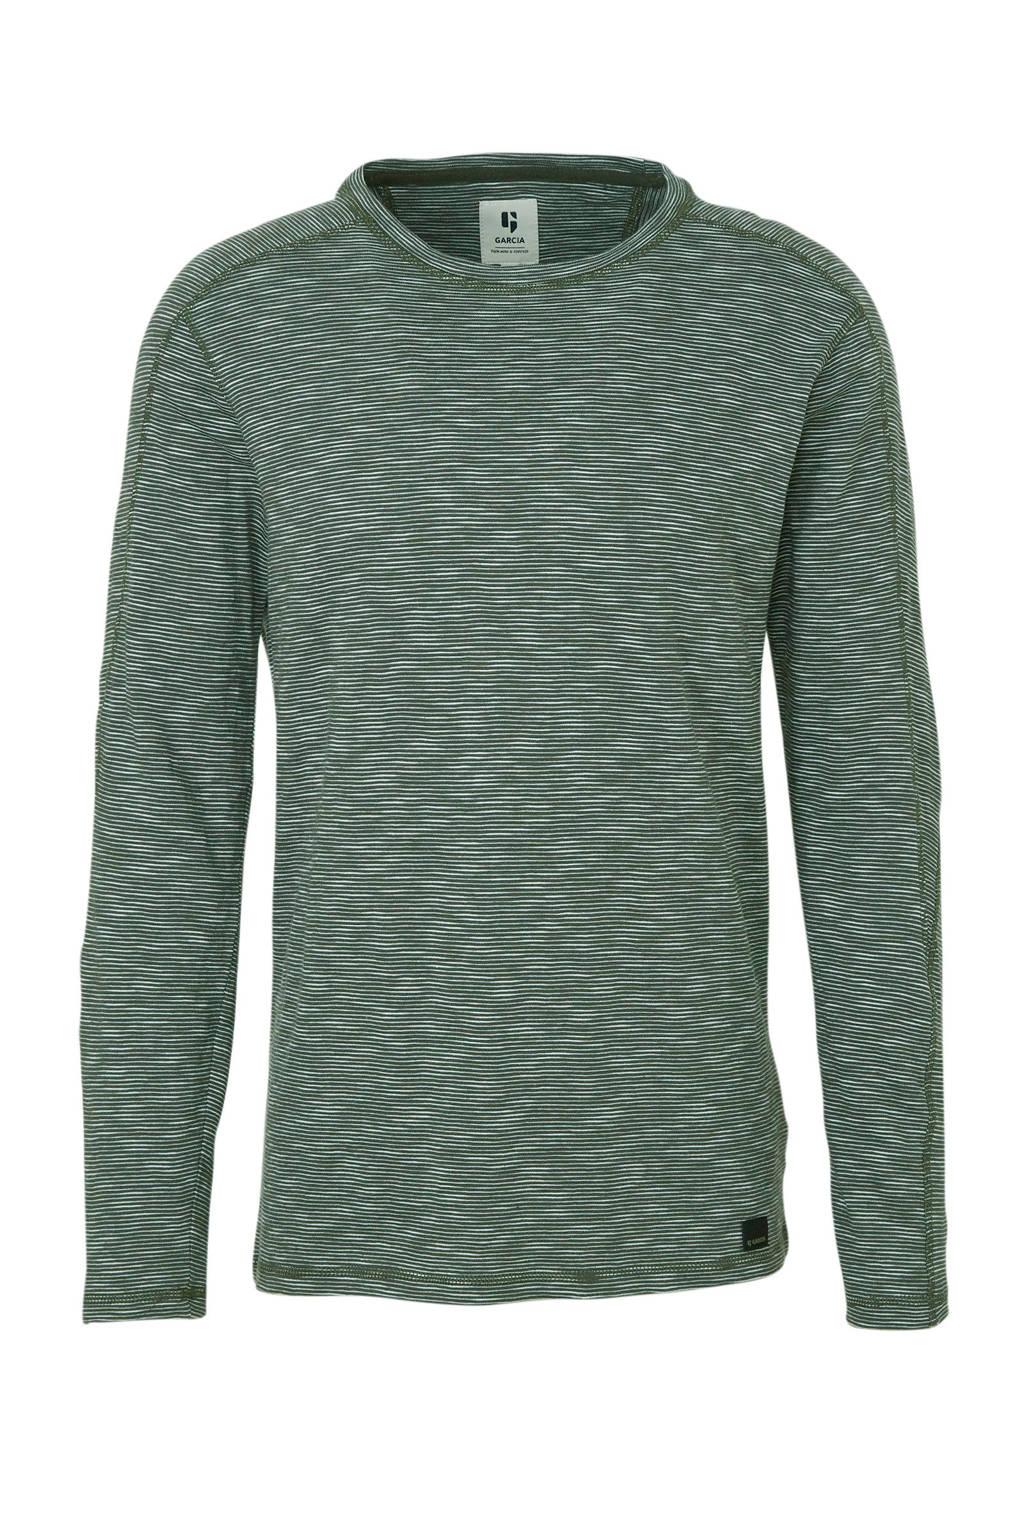 Garcia gestreept T-shirt groen/wit, Groen/wit